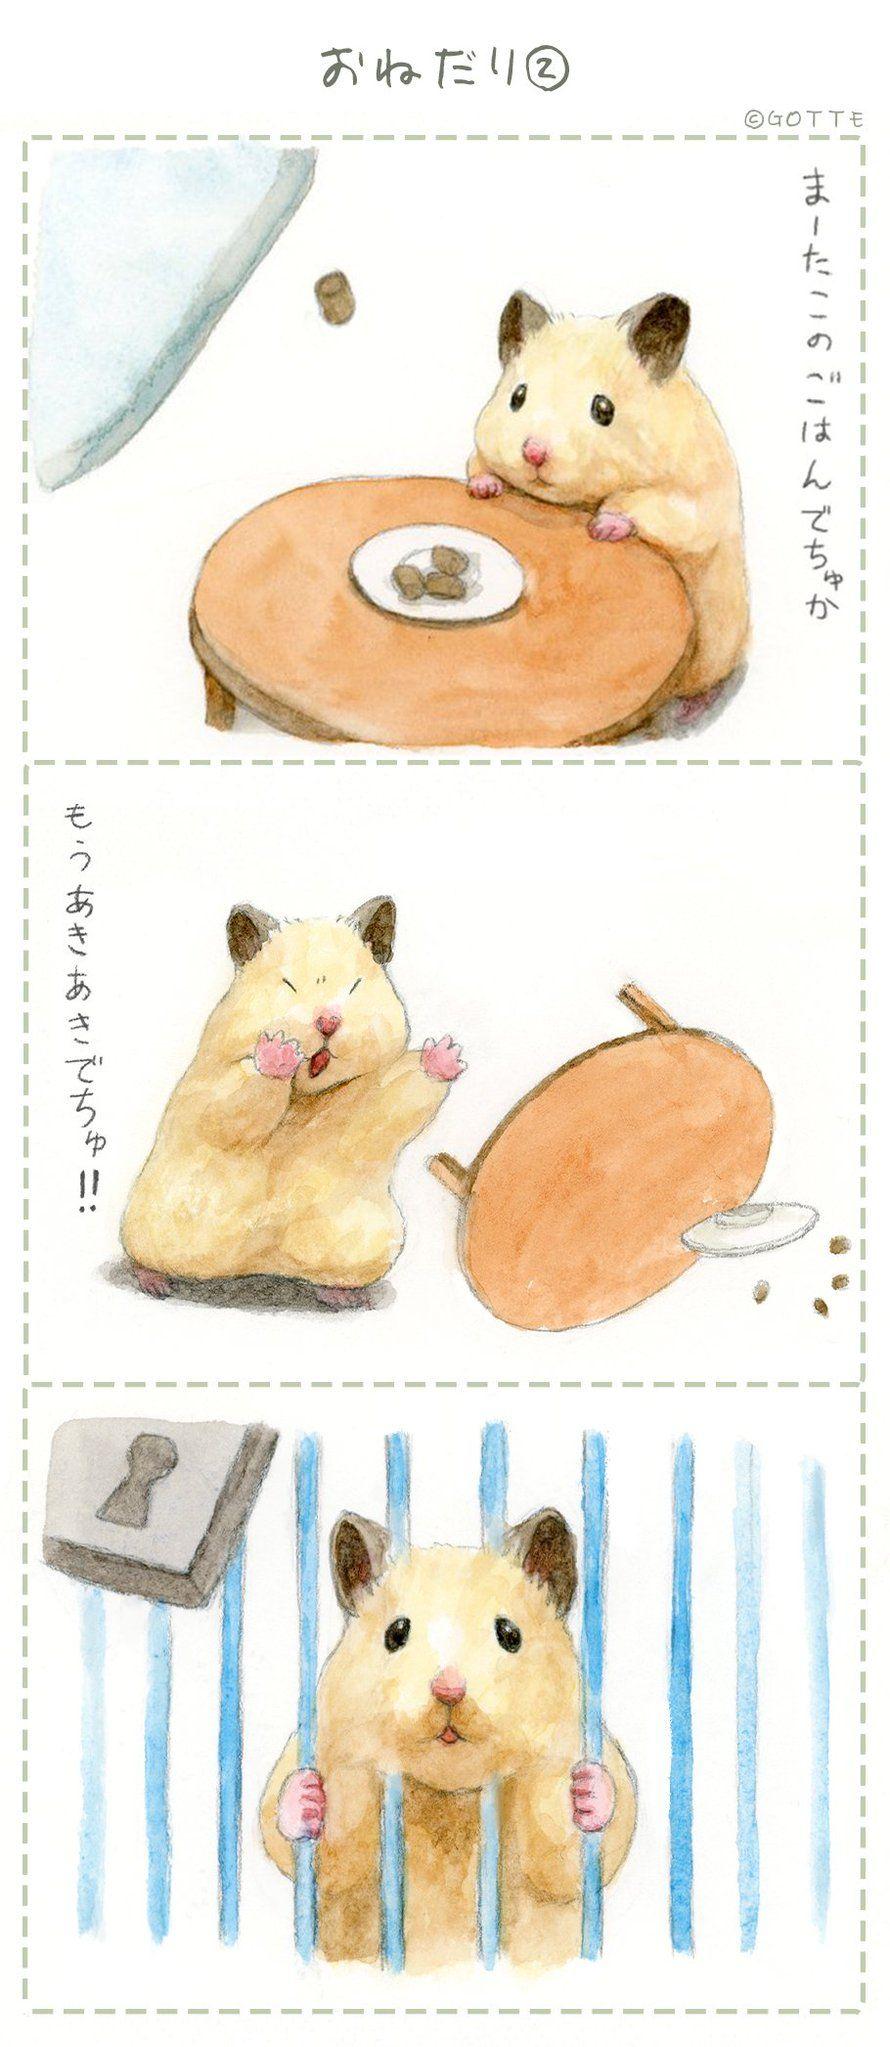 Gotte ハムスター画家 On Twitter Cute Animal Drawings Cute Hamsters Cute Animals